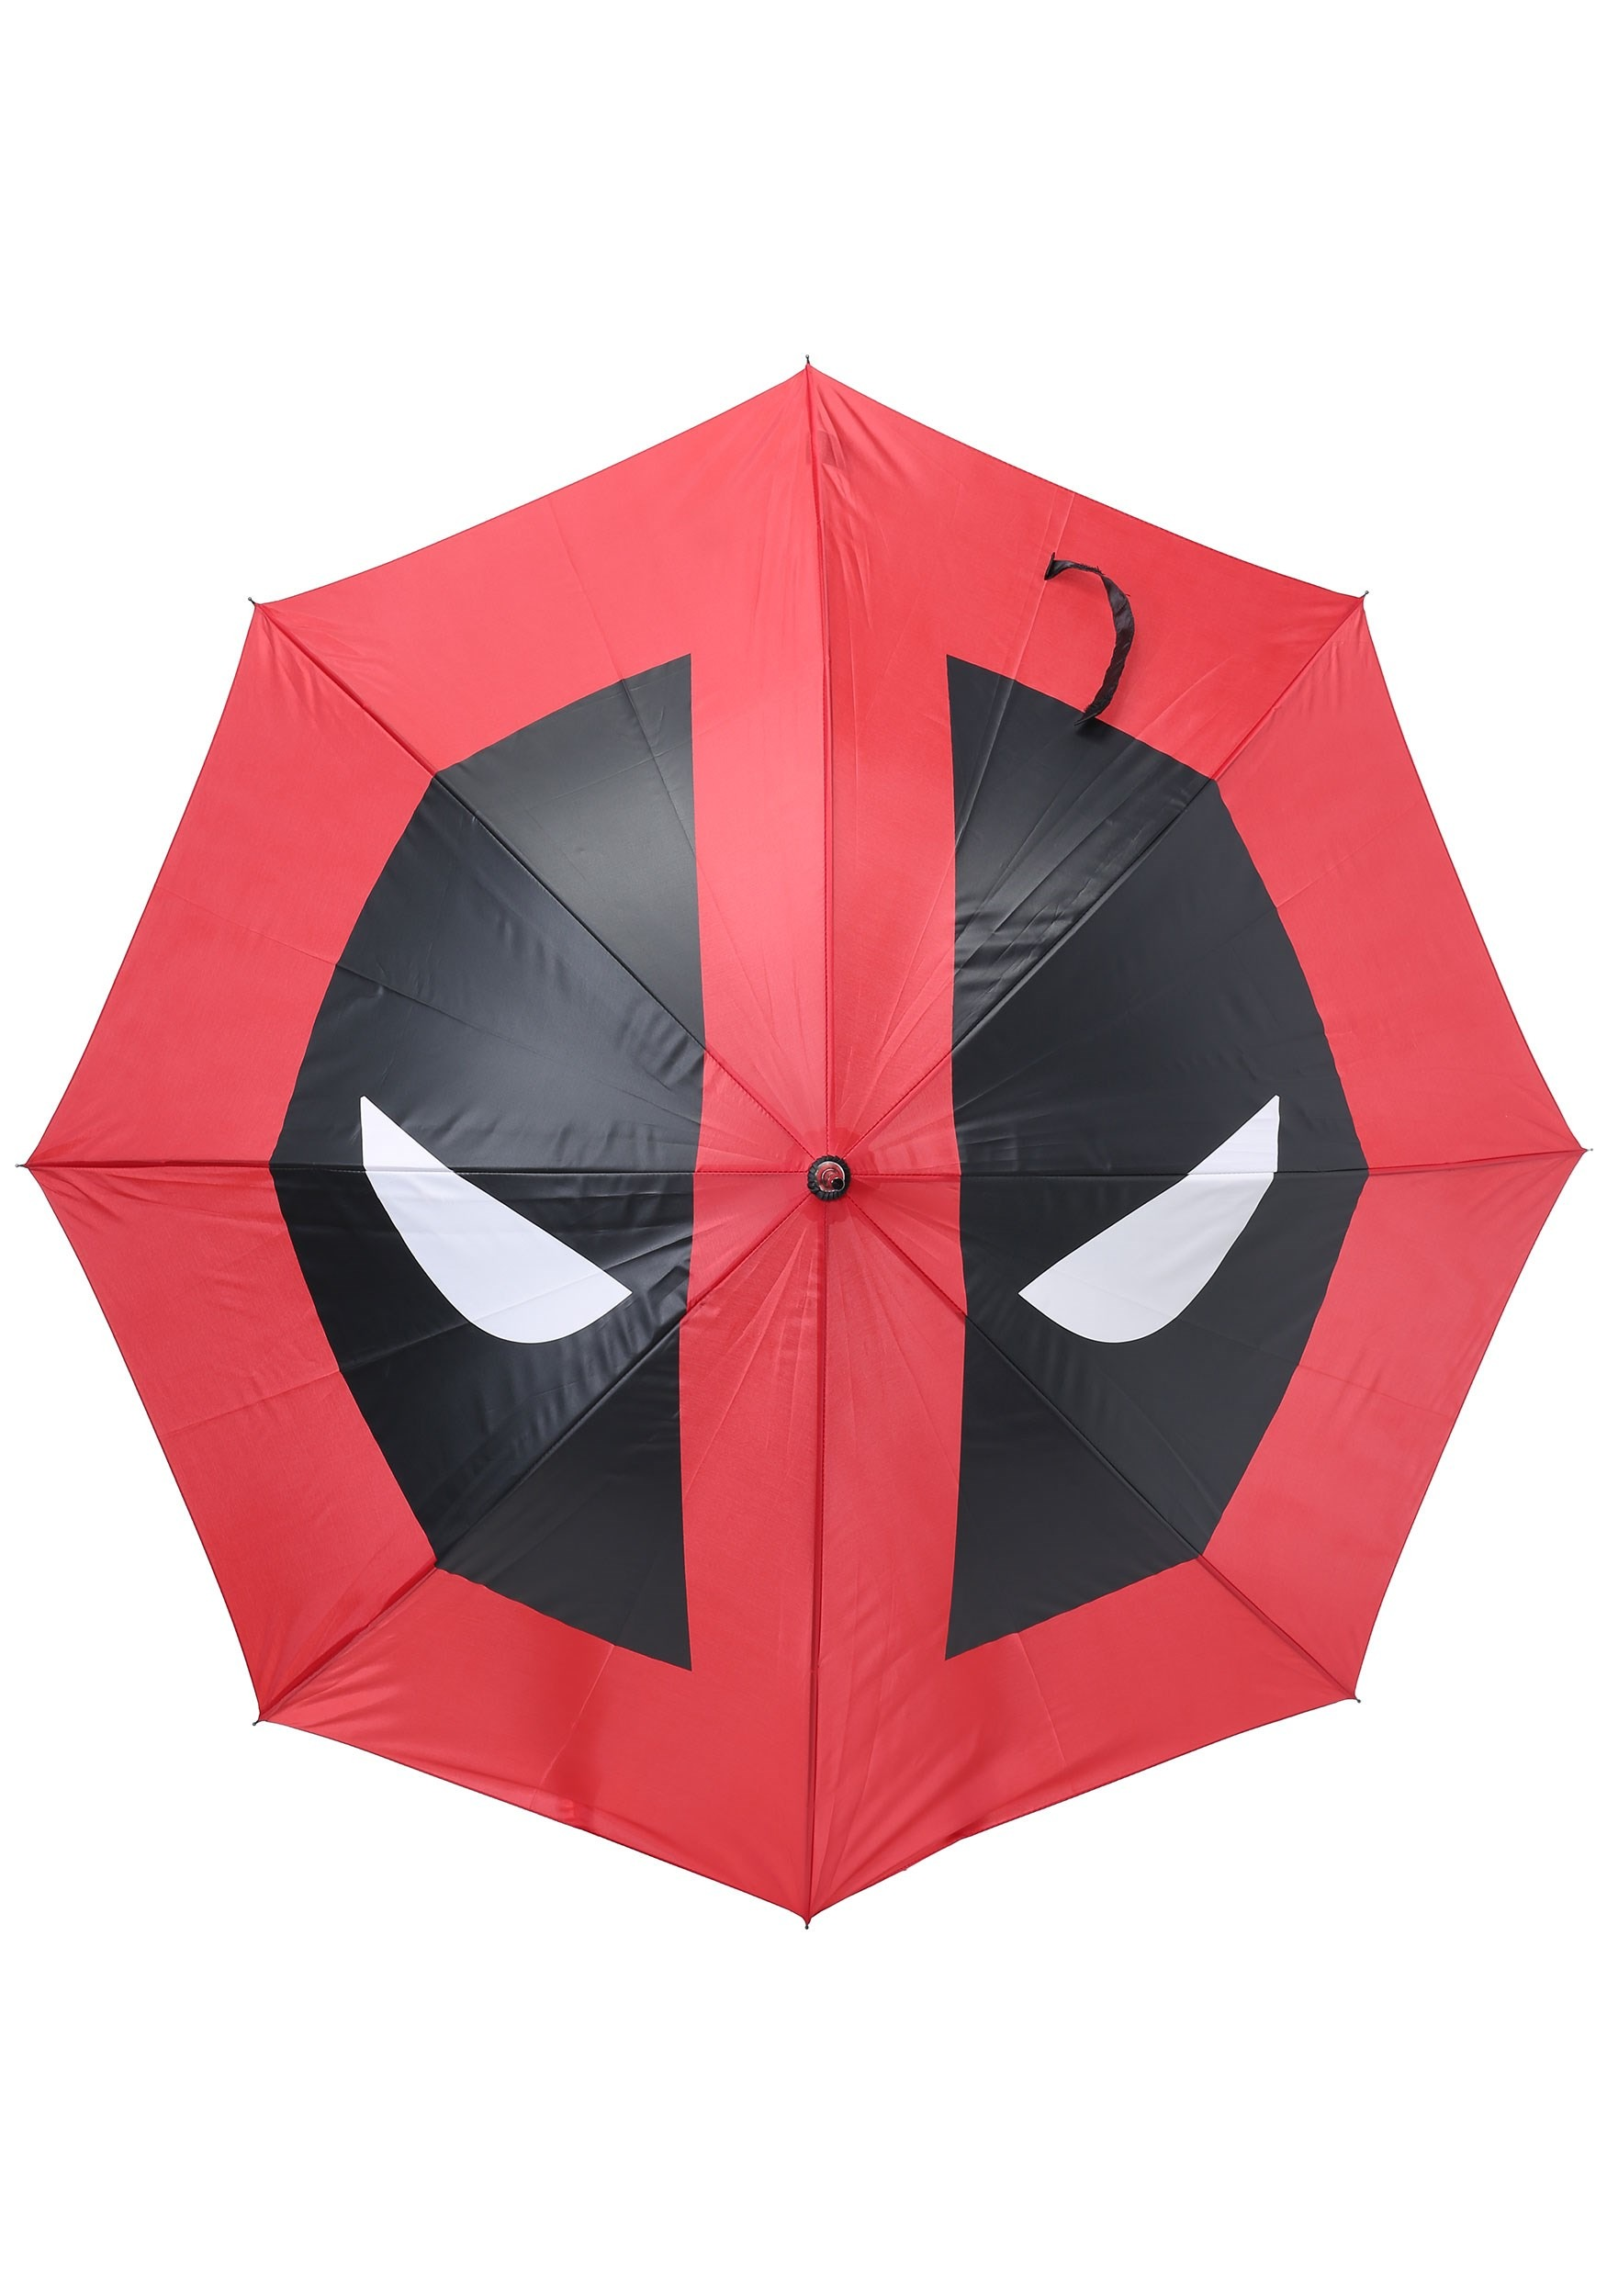 Deadpool Katana Over the Shoulder Umbrella Red